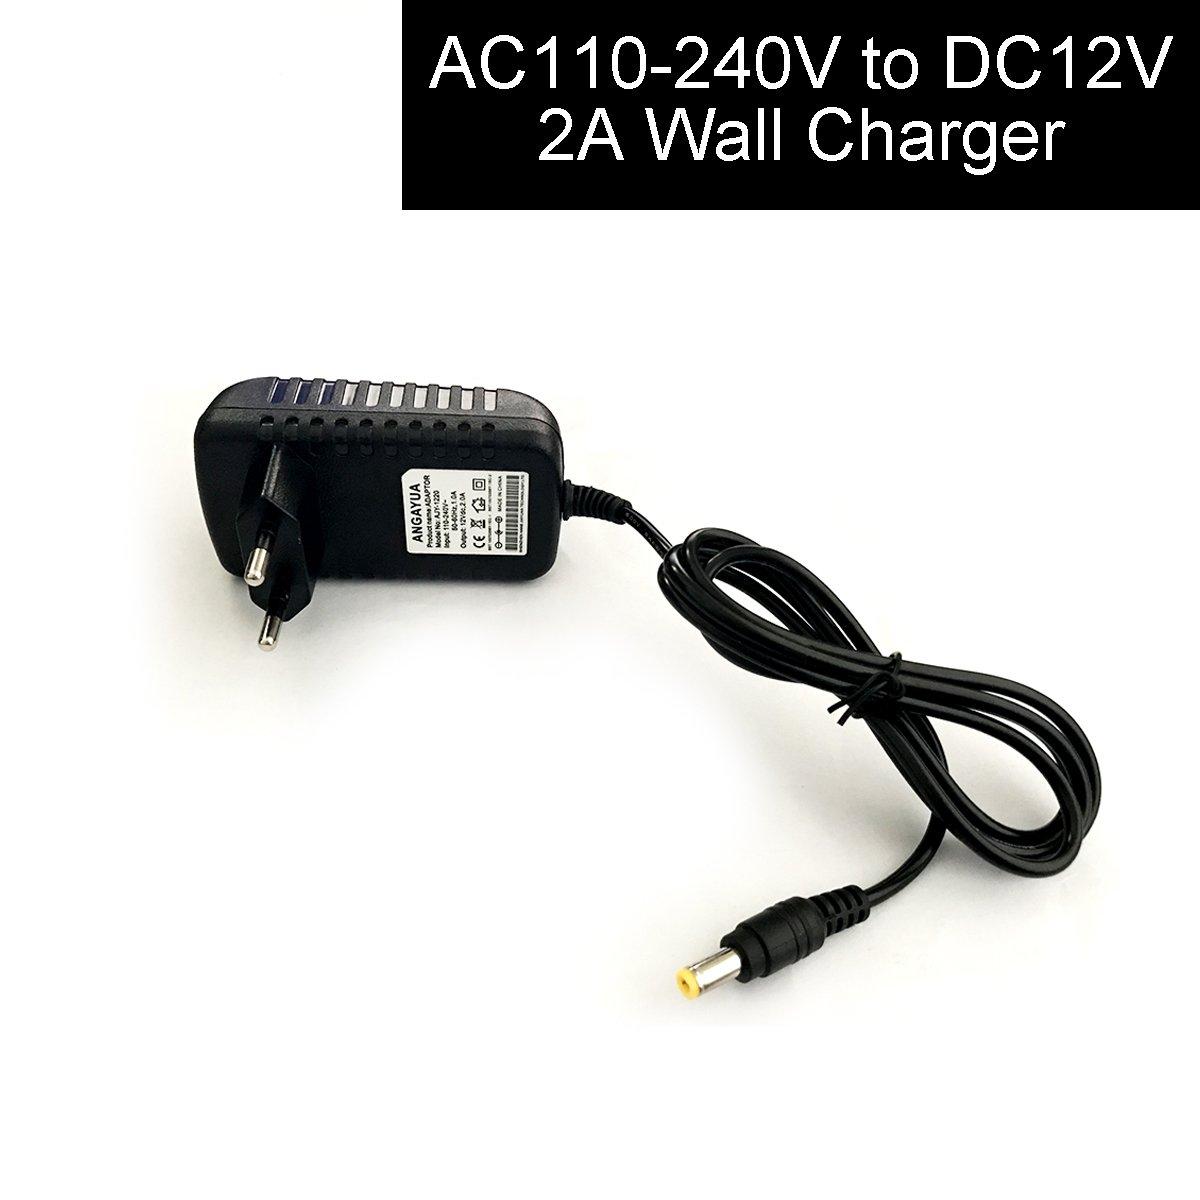 Cocar DC CC 5.5x2.1mm 1 Hembra a 8 Macho Power Cable Divisor Adaptador Convertidor para Coche Cá mara Visió n Trasera de Seguridad Monitor CCTV Luces LED